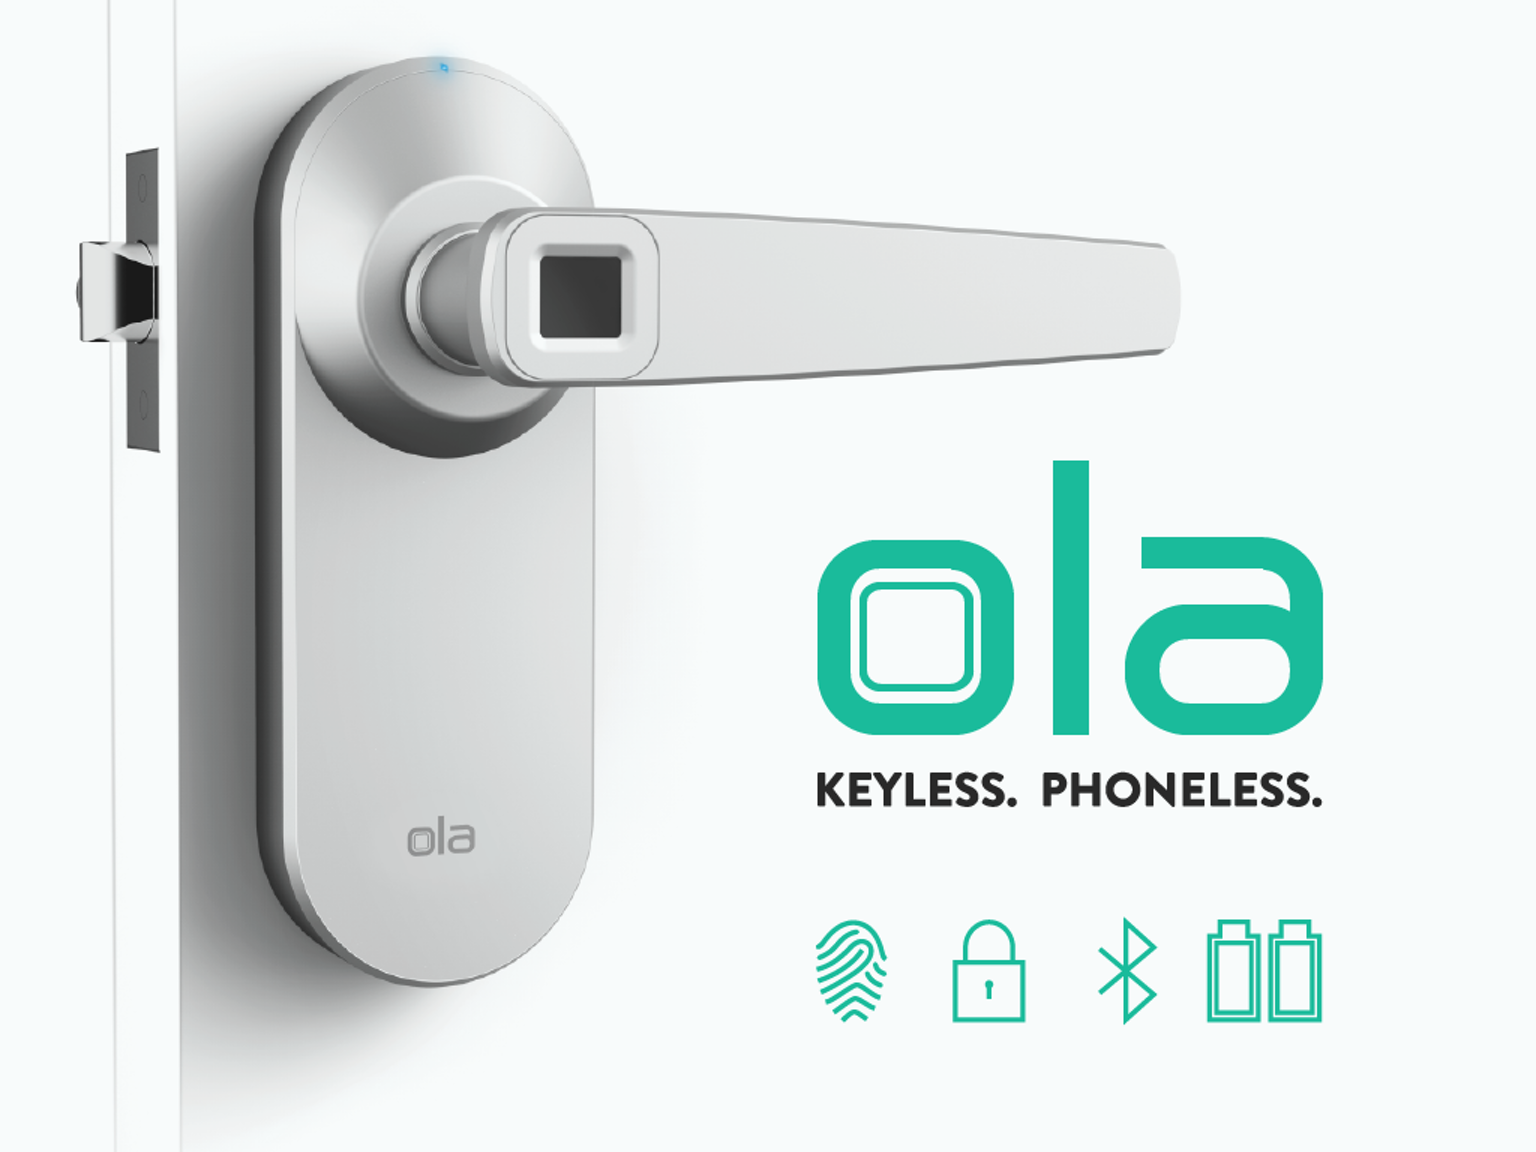 ola the worldu0027s first keyless and phoneless bluetooth enabled fingerprint smart lock the fastest